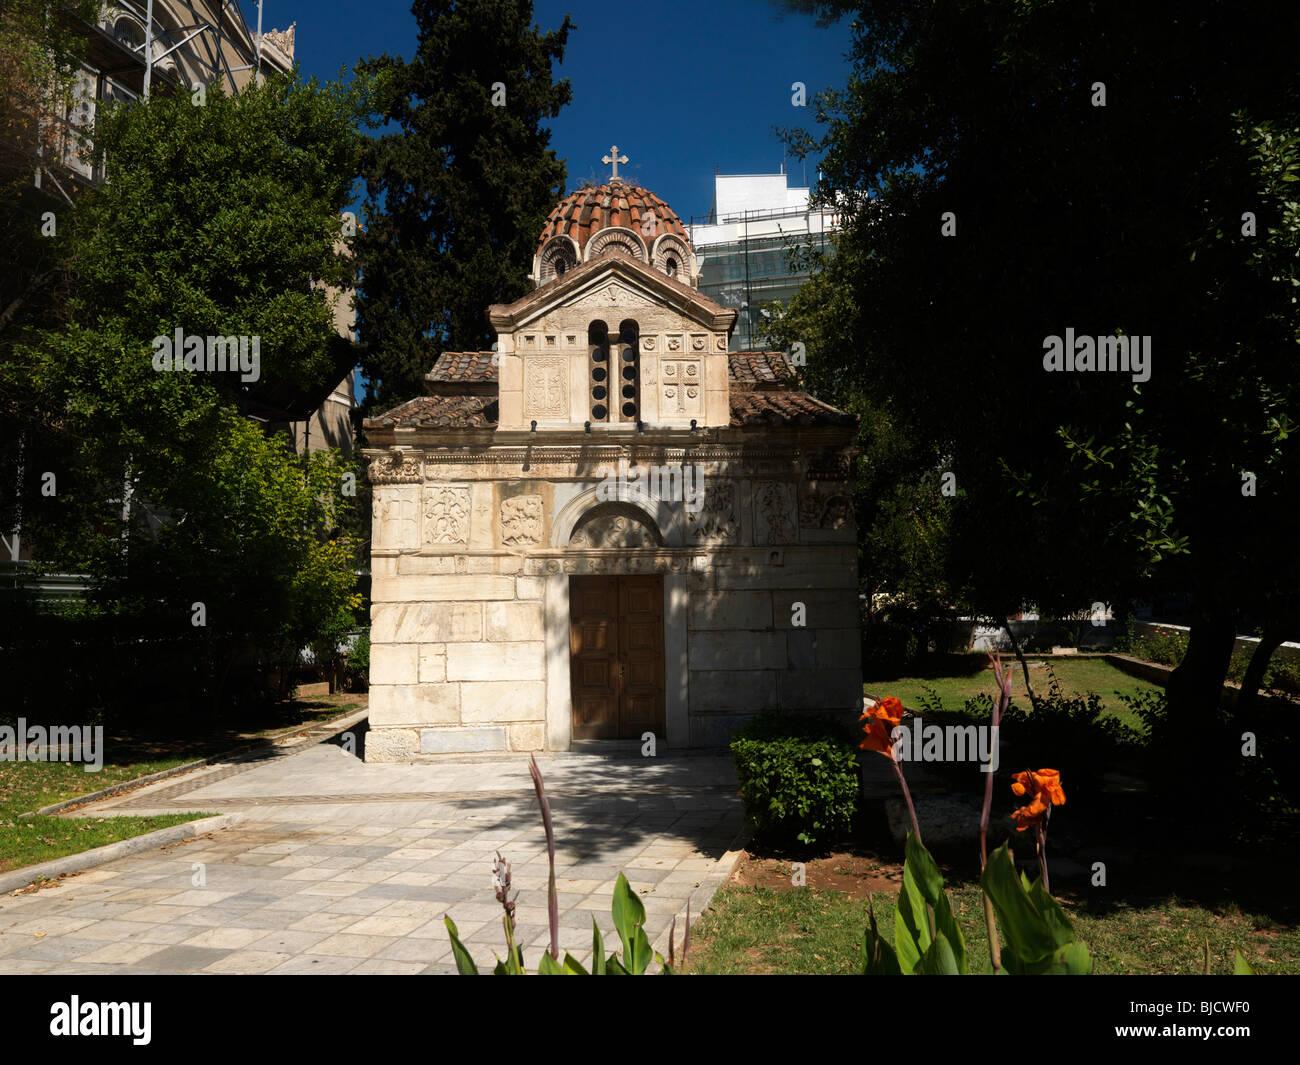 Athens Greece Panagia Gorgoepikoos (The Madonna Who Swiftly Hears) Church - Stock Image